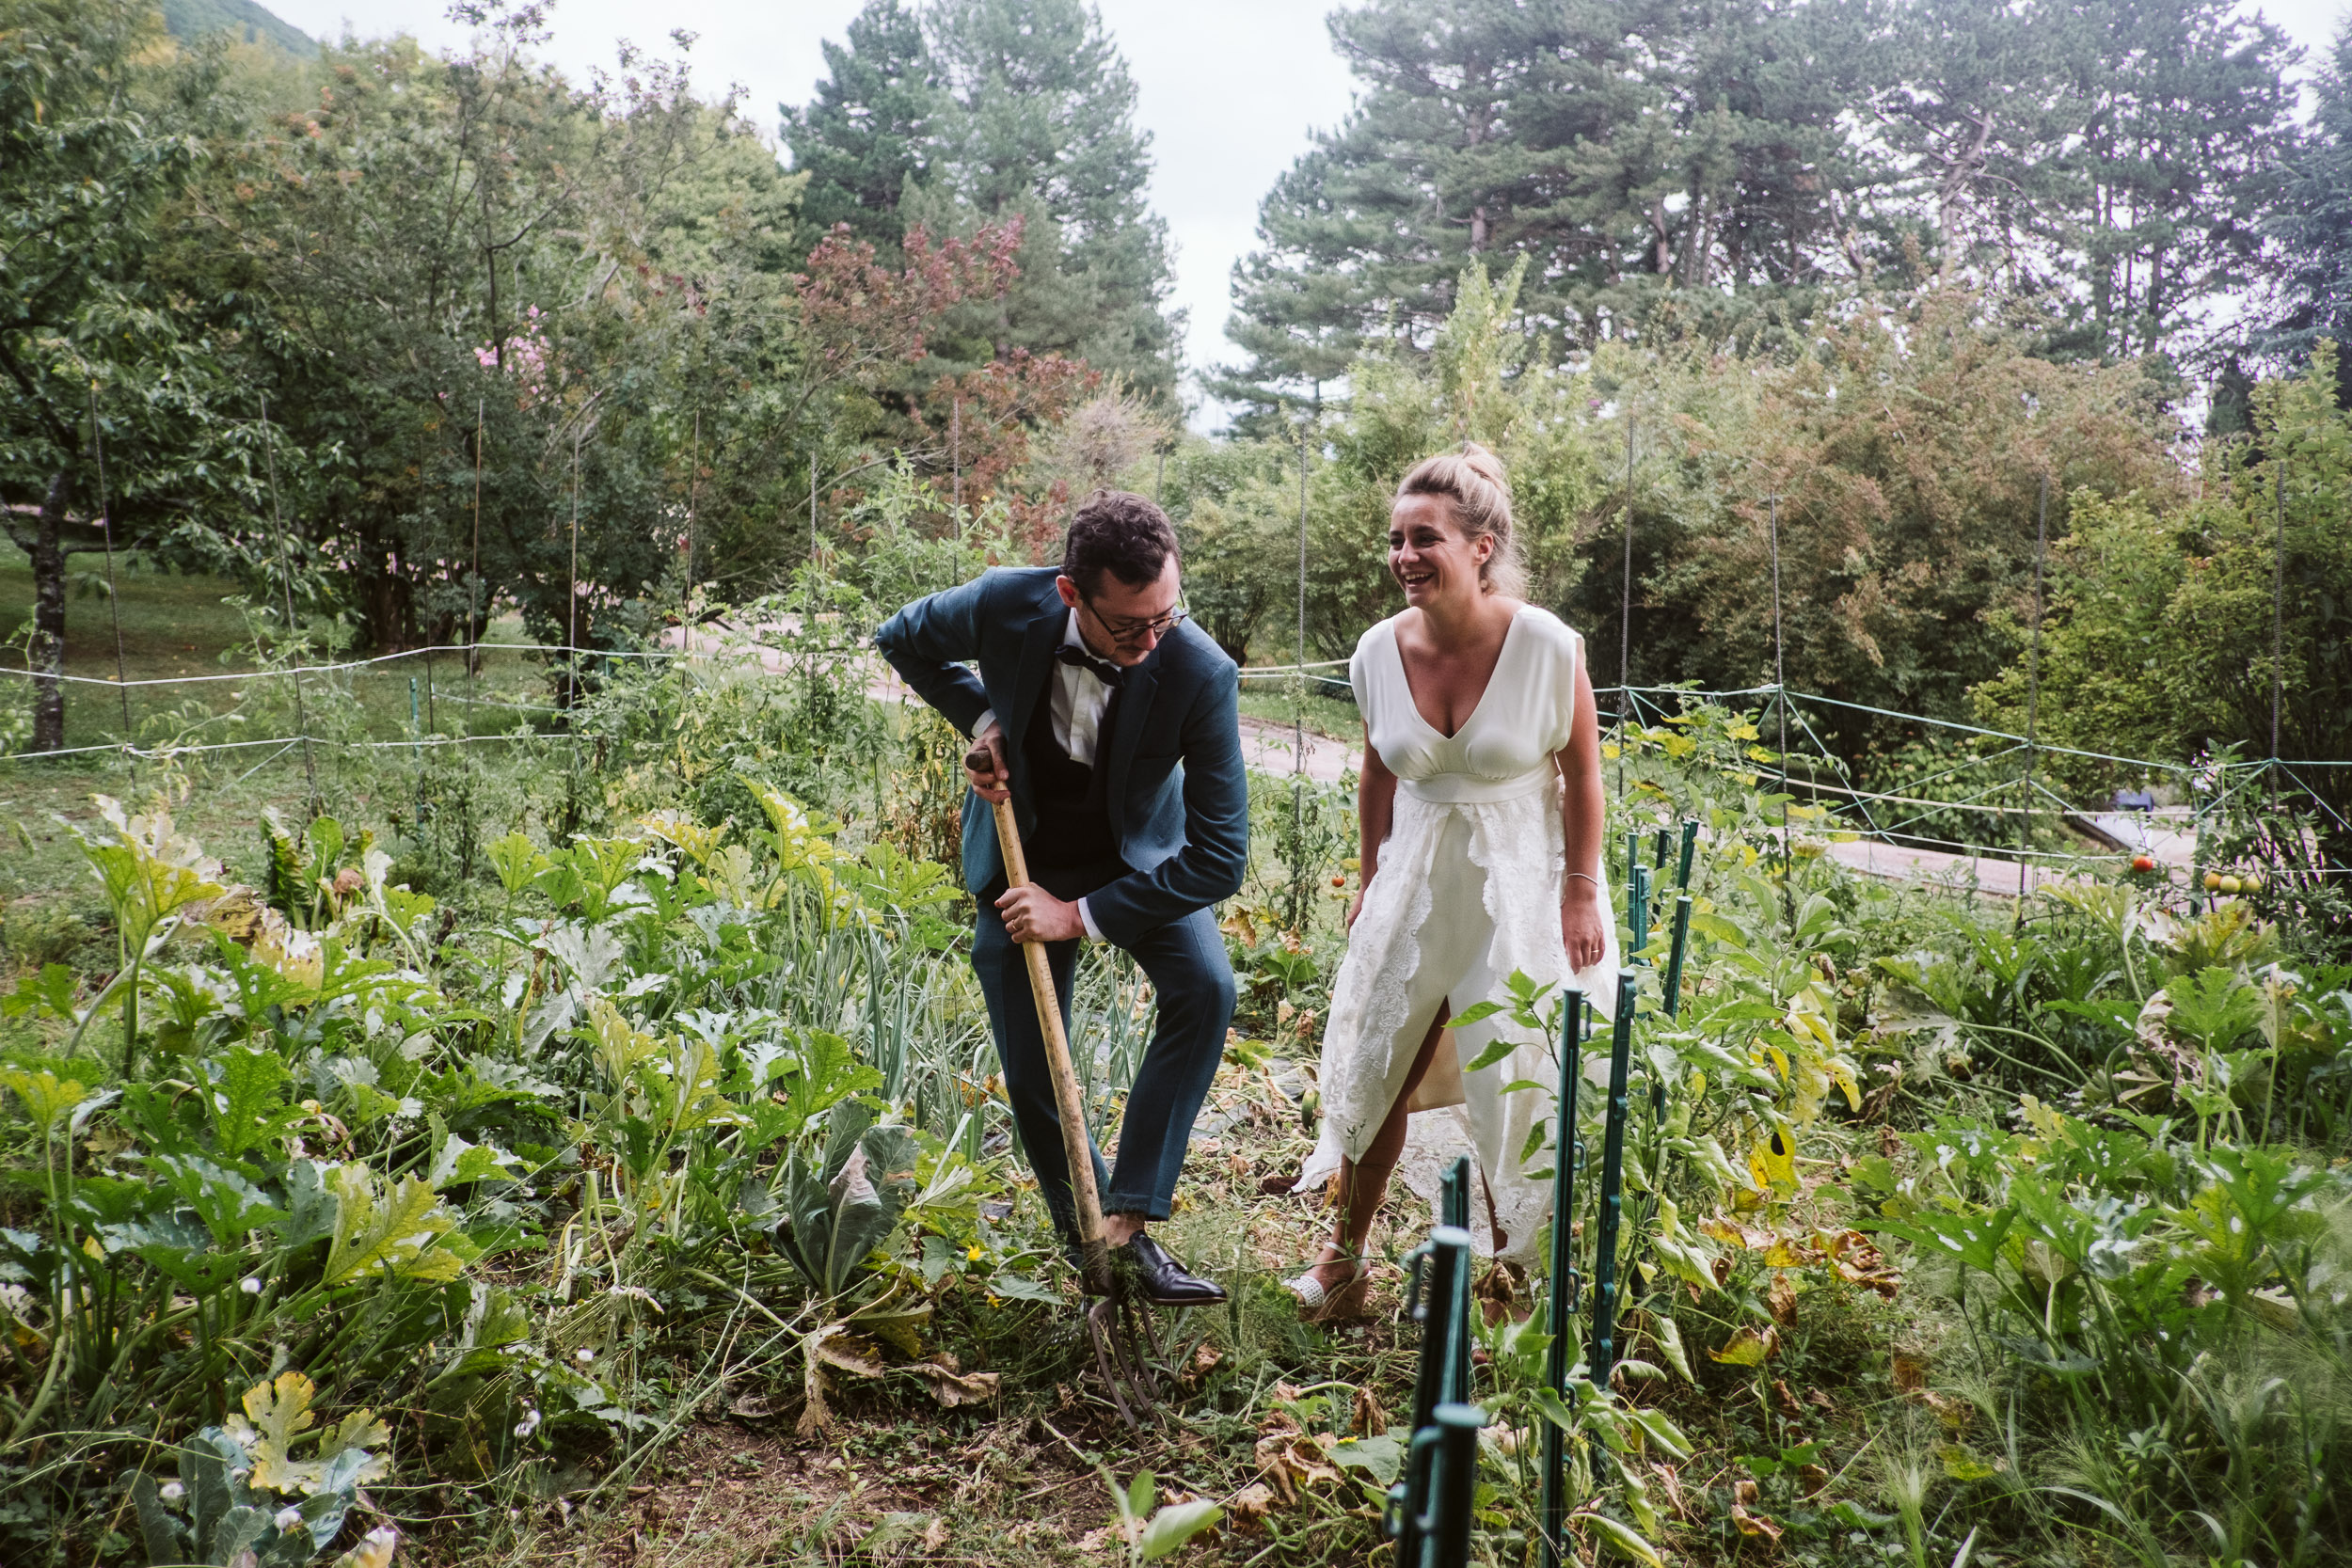 gerald-mattel-photographe-mariage-annecy-verrier-menthon-12.jpg